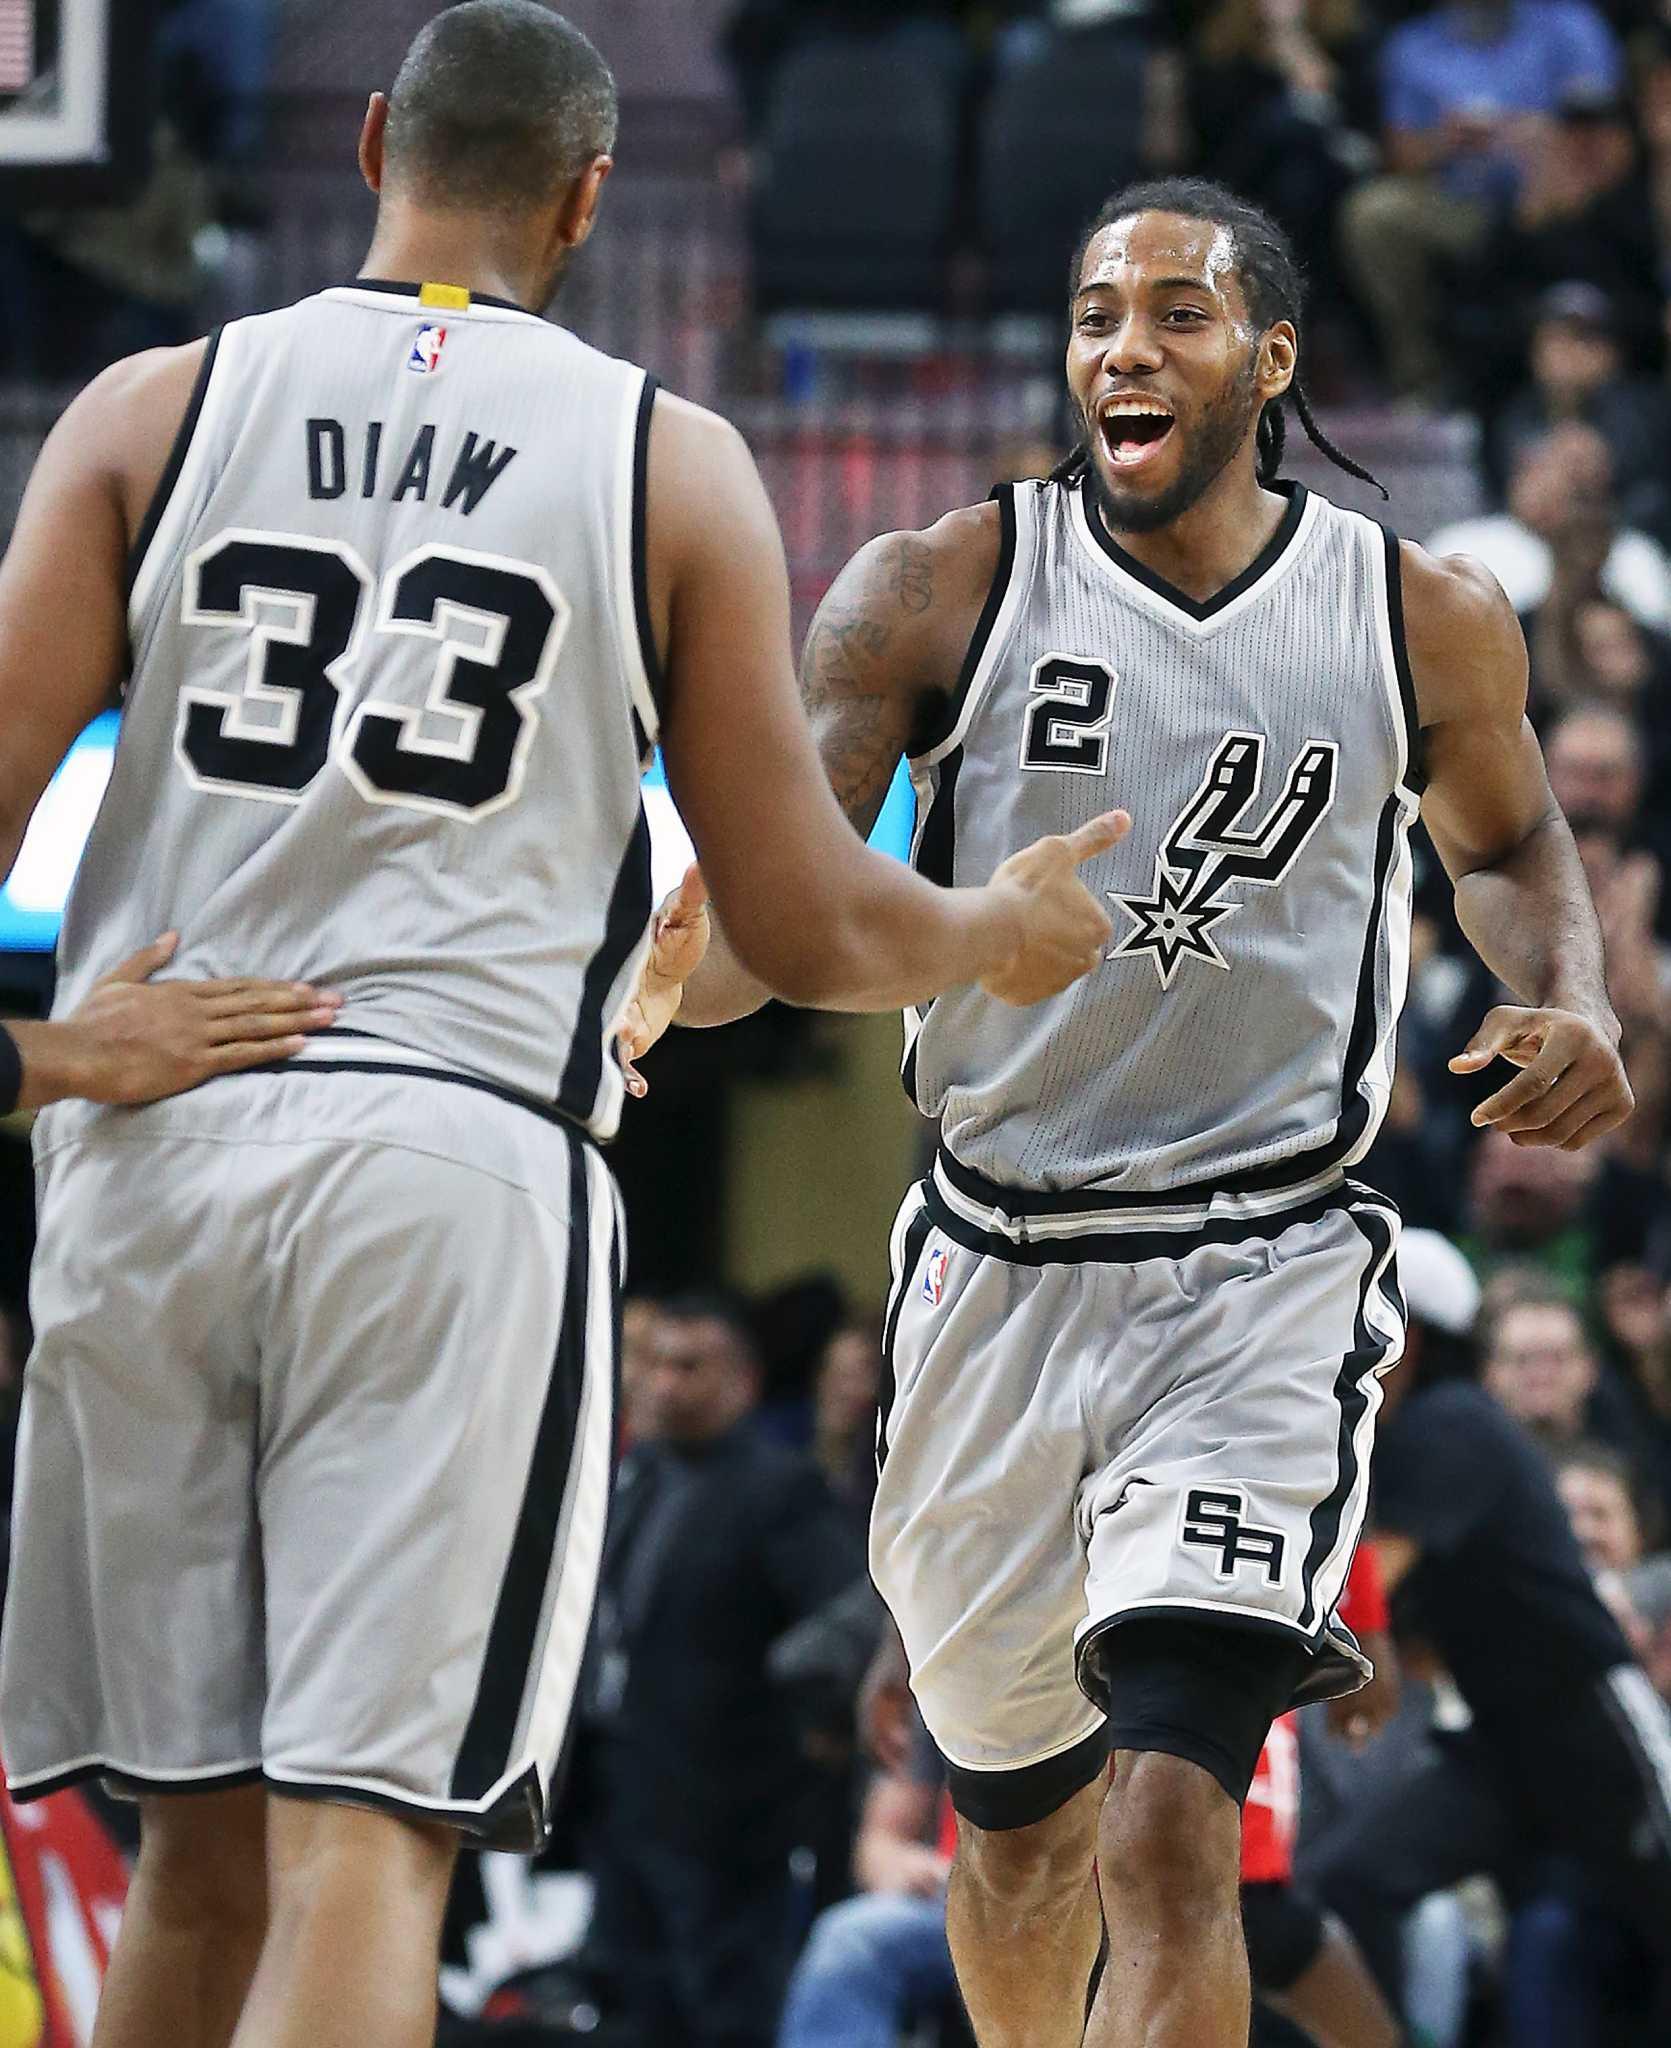 ... Boris Late push makes Spurs Leonard All-Star starter - San Antonio  Express-News ... 2ec463bd8